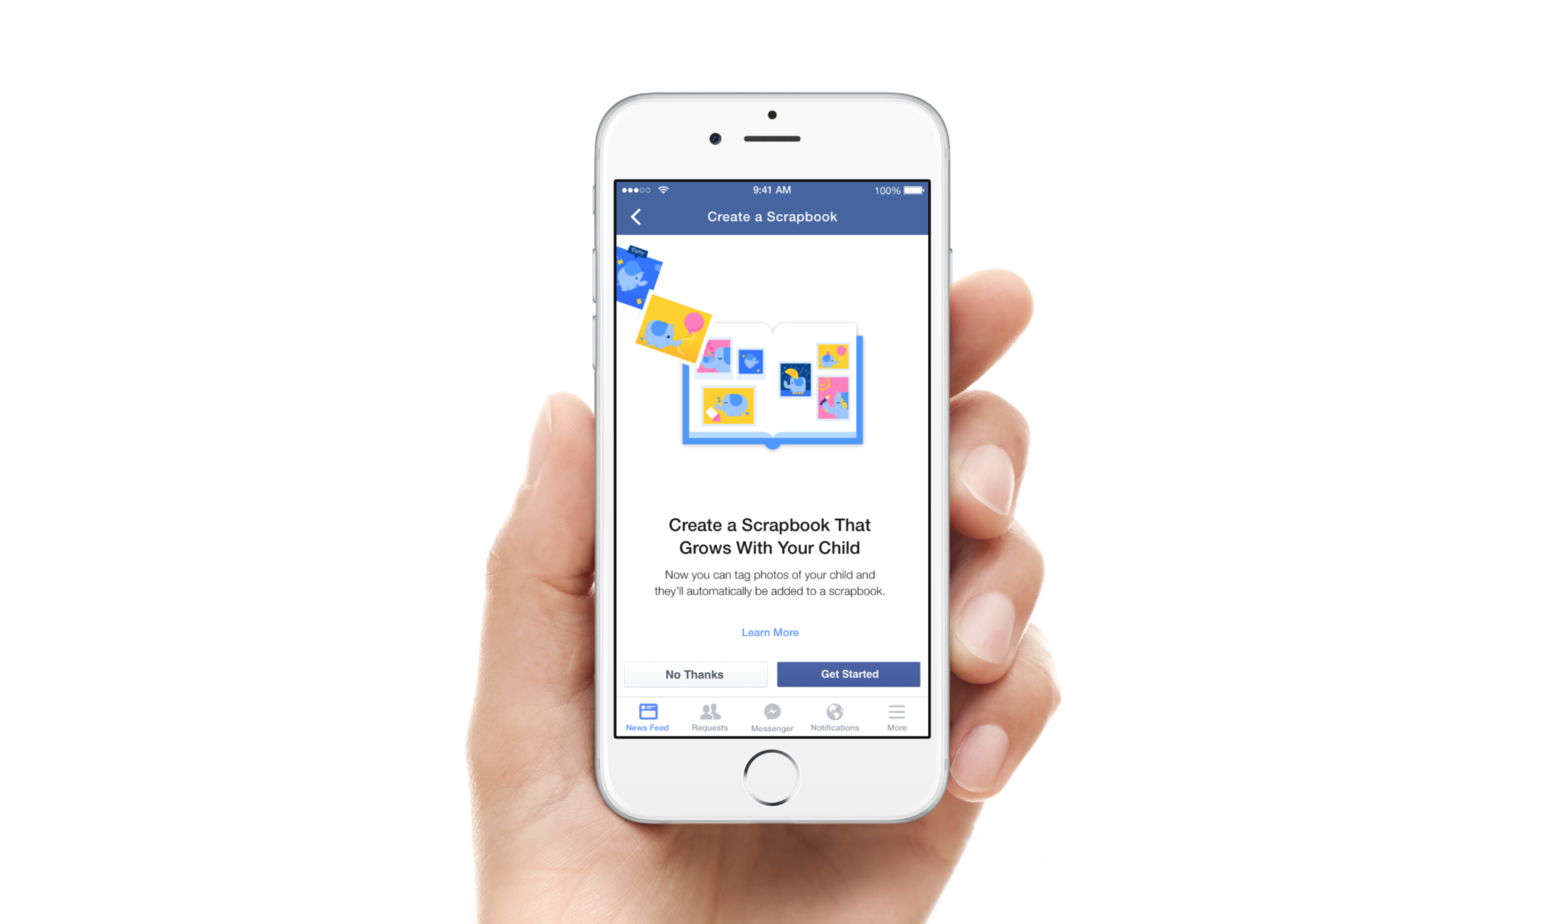 How to Create a Facebook Scrapbook